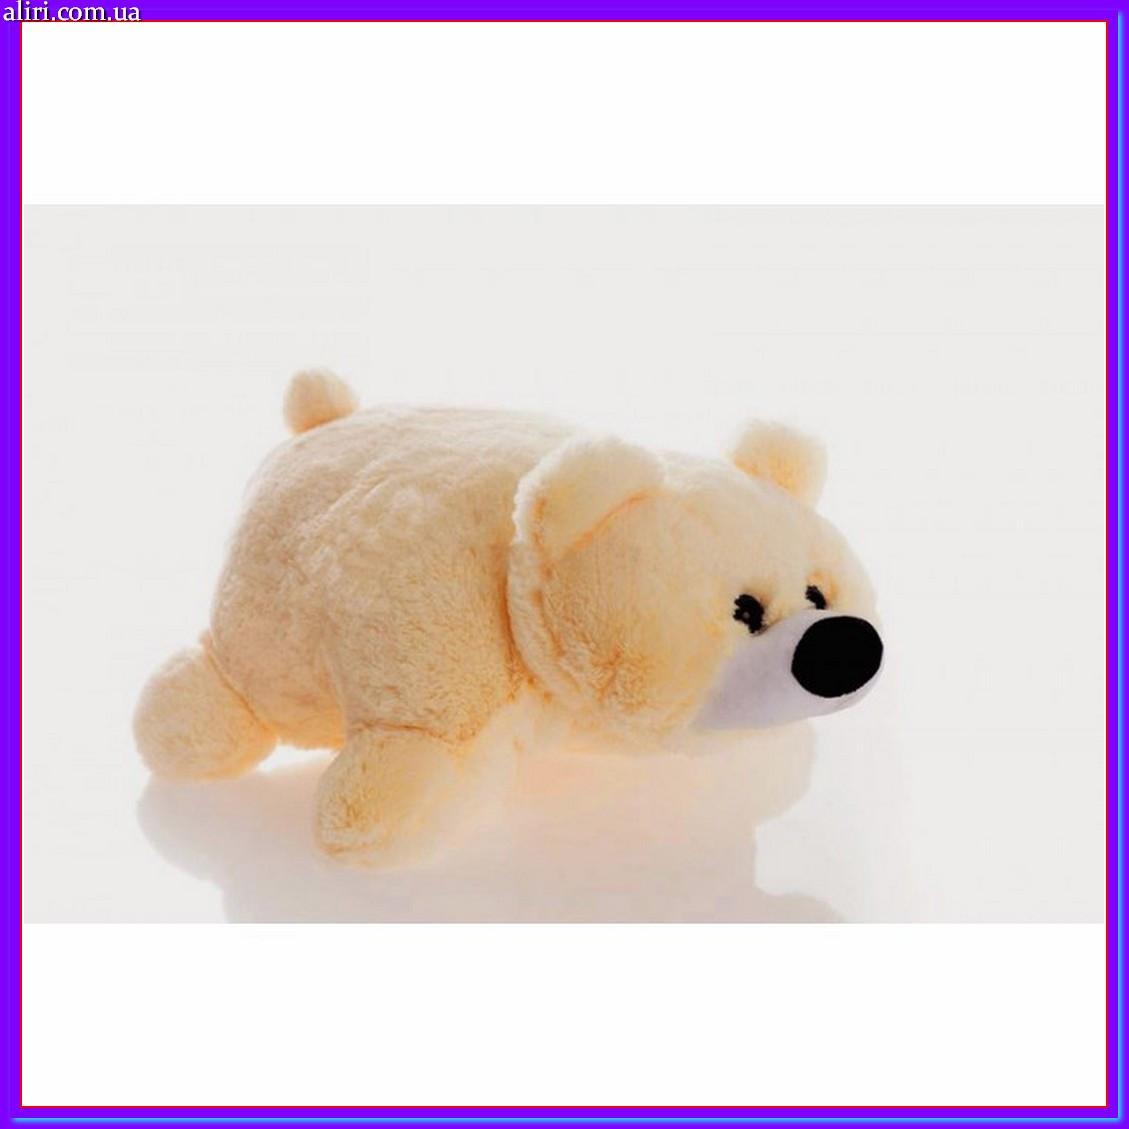 Декоративна дитяча подушка-трансформер ведмедик персик 55 см